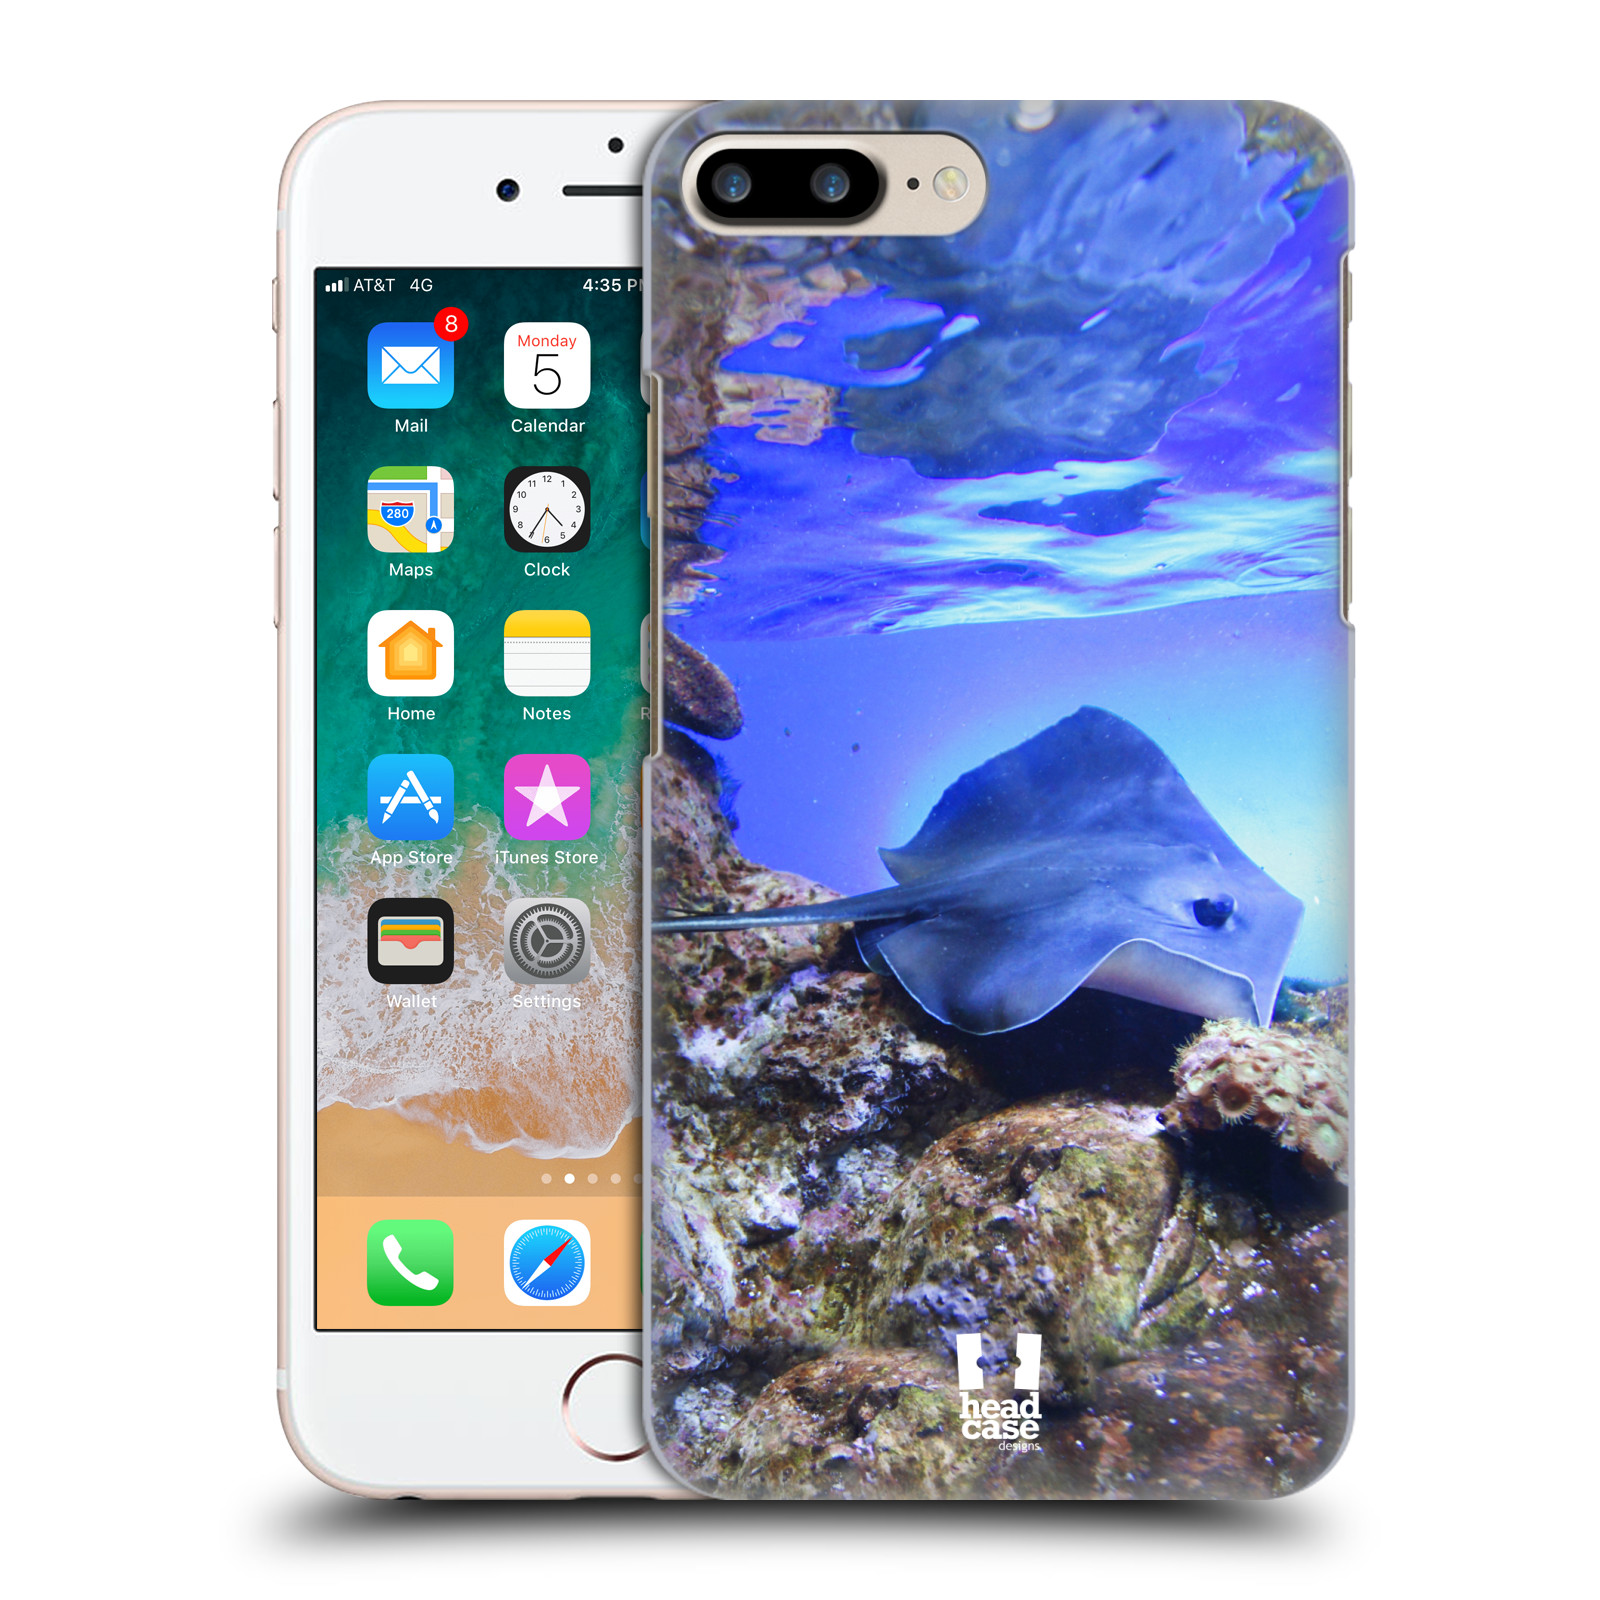 HEAD CASE plastový obal na mobil Apple Iphone 7 PLUS vzor slavná zvířata foto rejnok